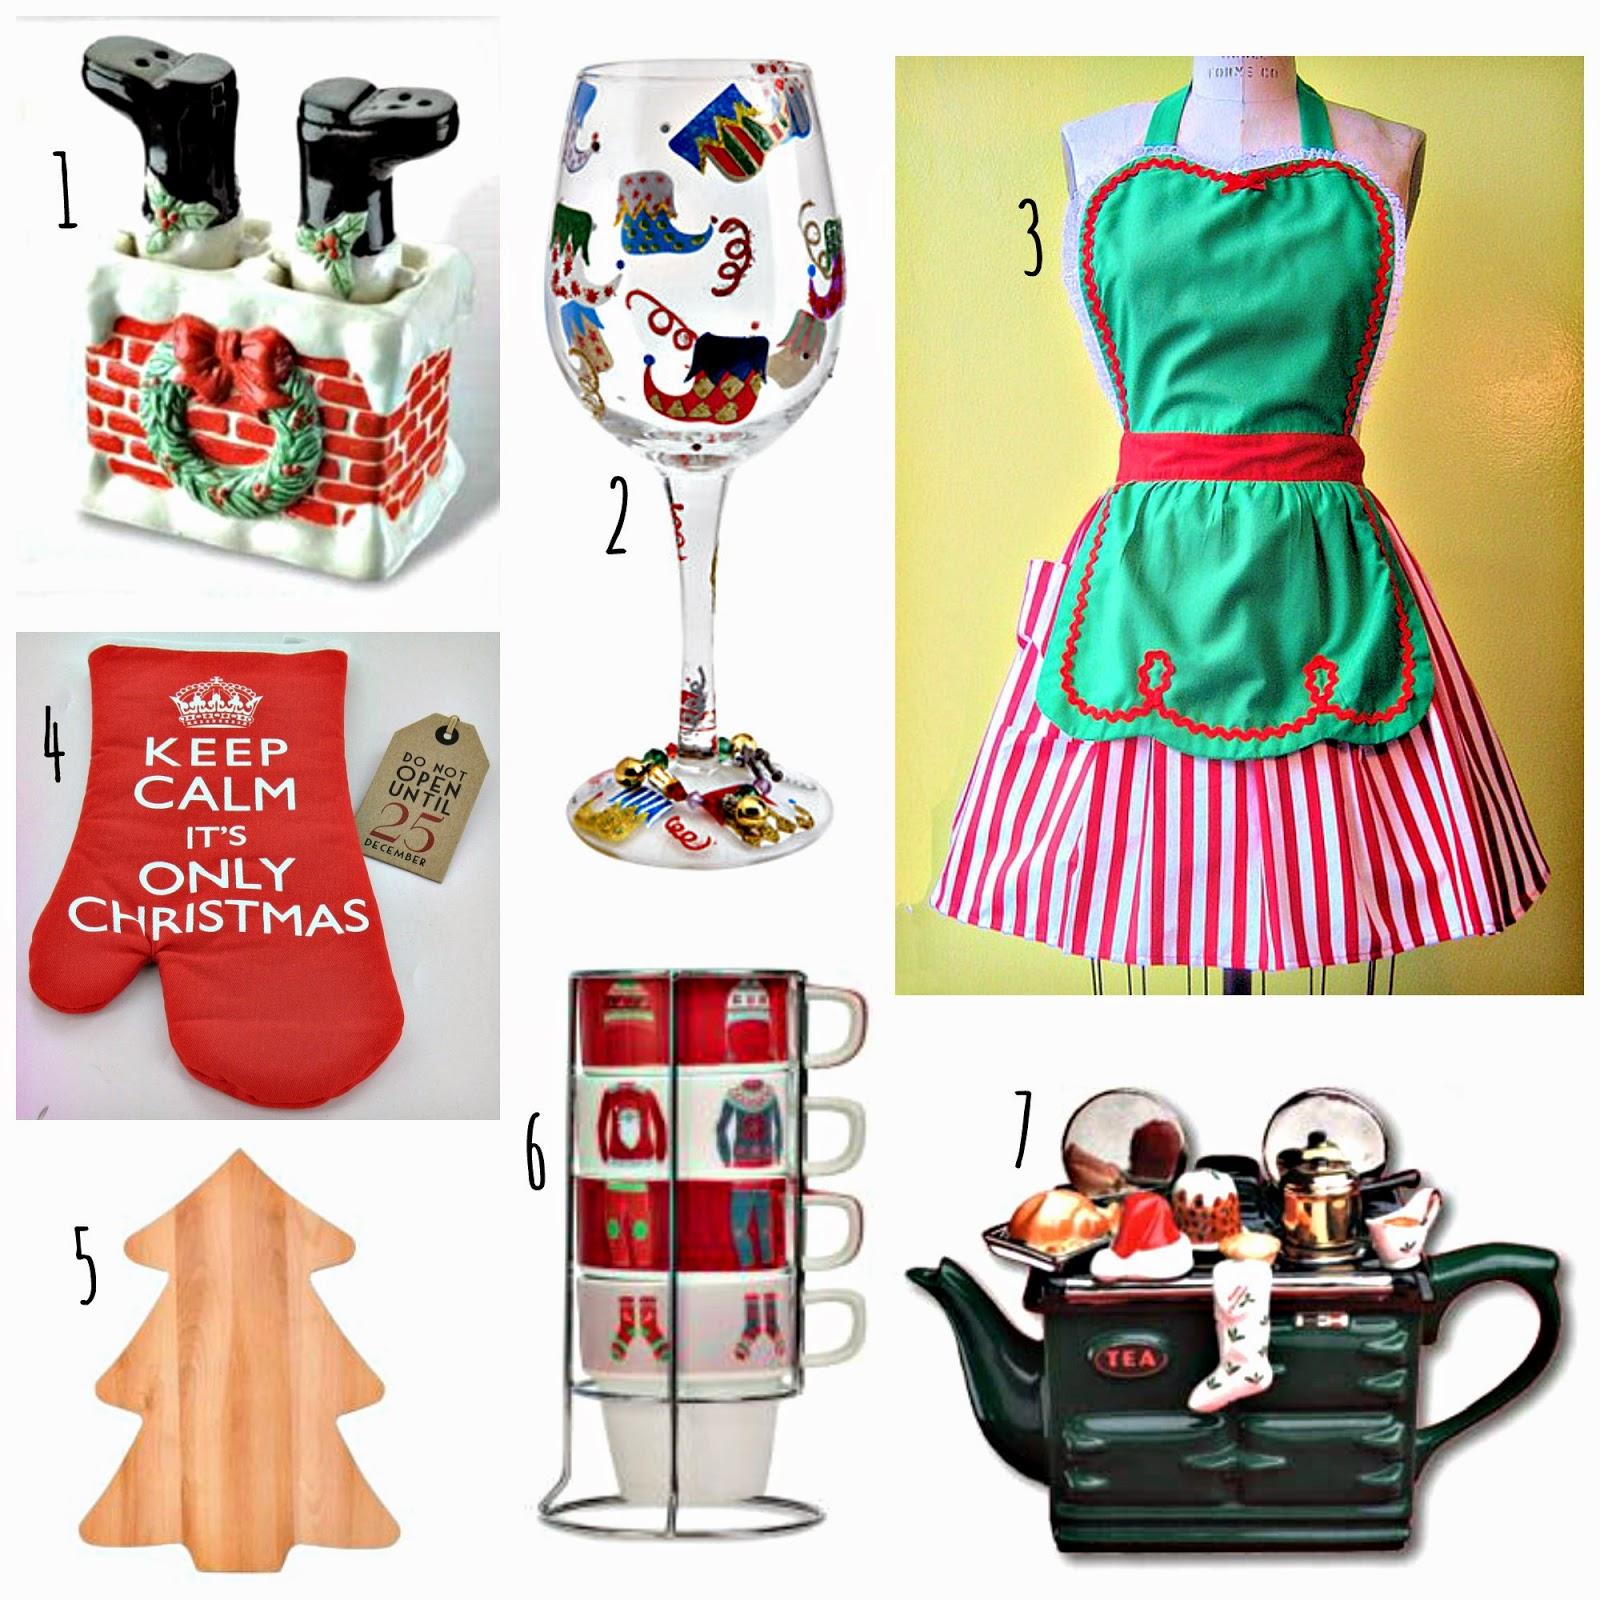 Live Love Laugh...: BLOGMAS Day 7: Christmas Kitchen...